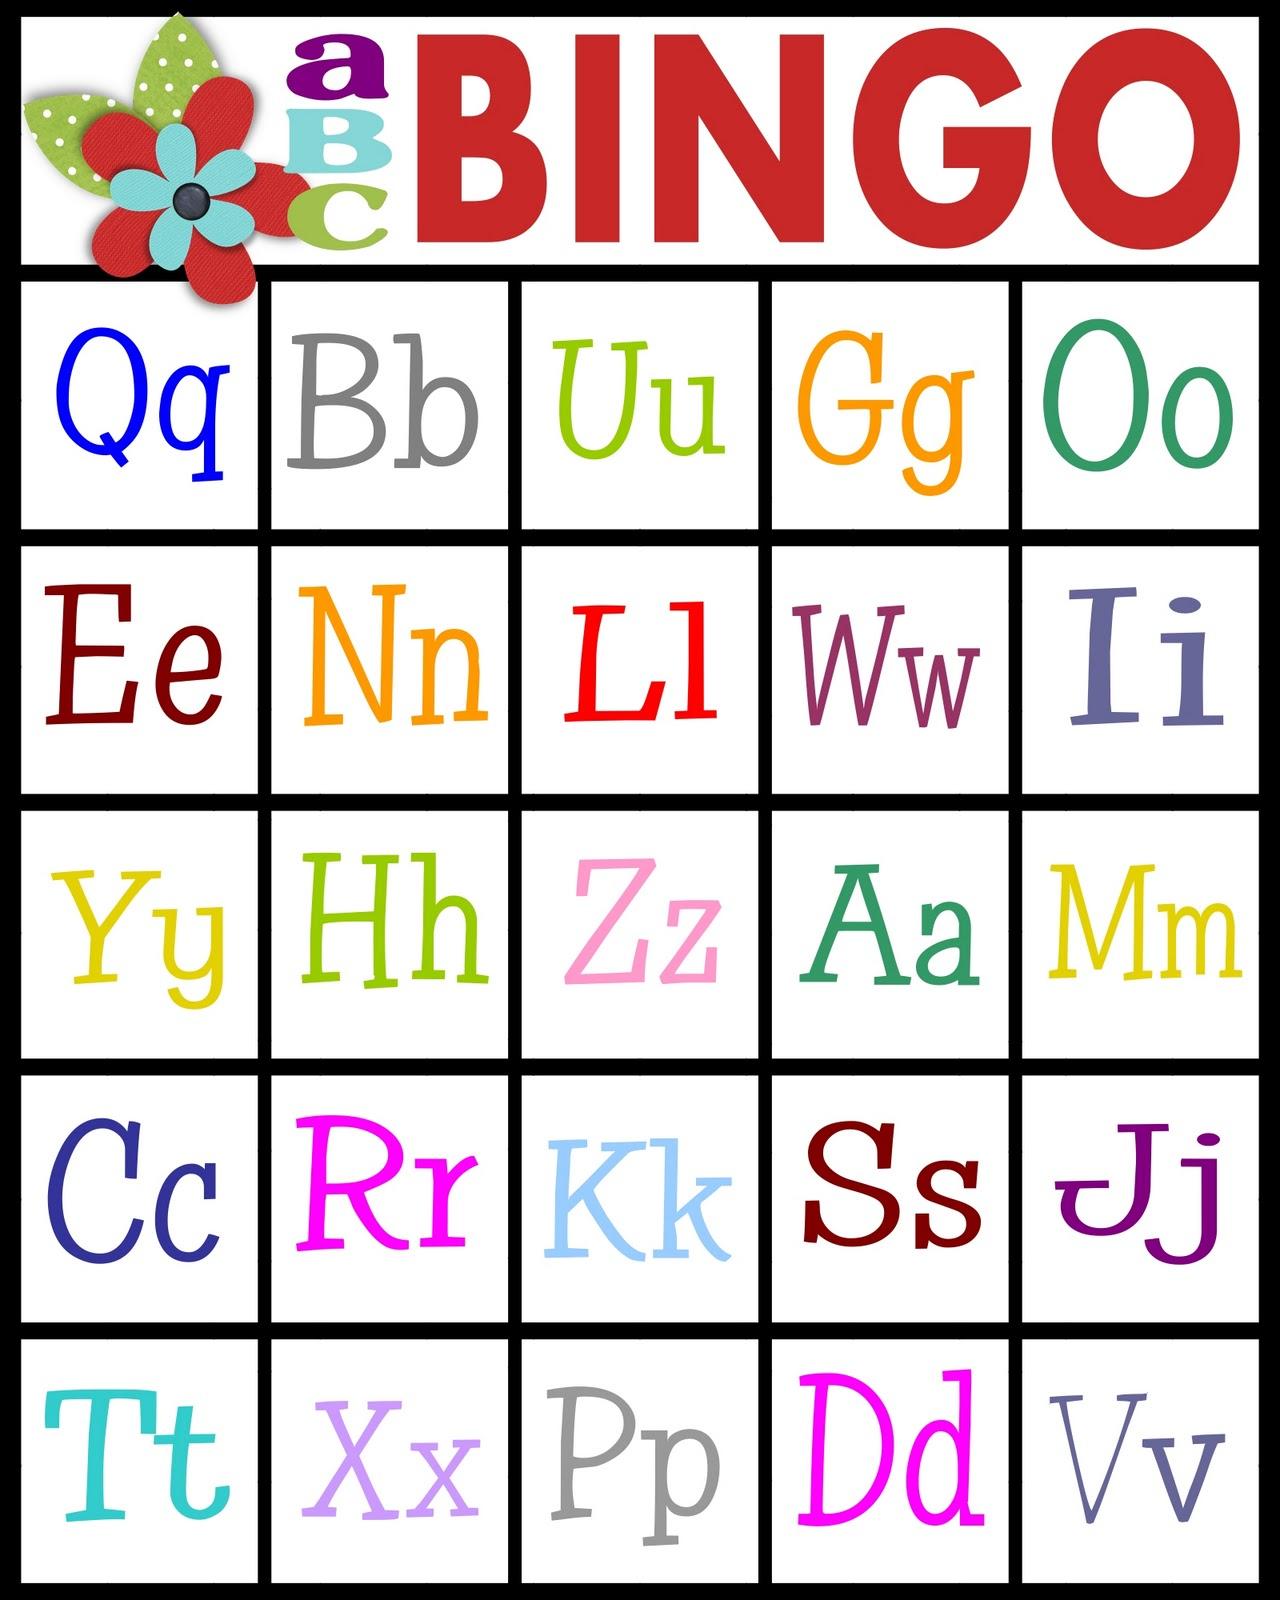 Abc's Bingo- Free Printable! - Sassy Sanctuary